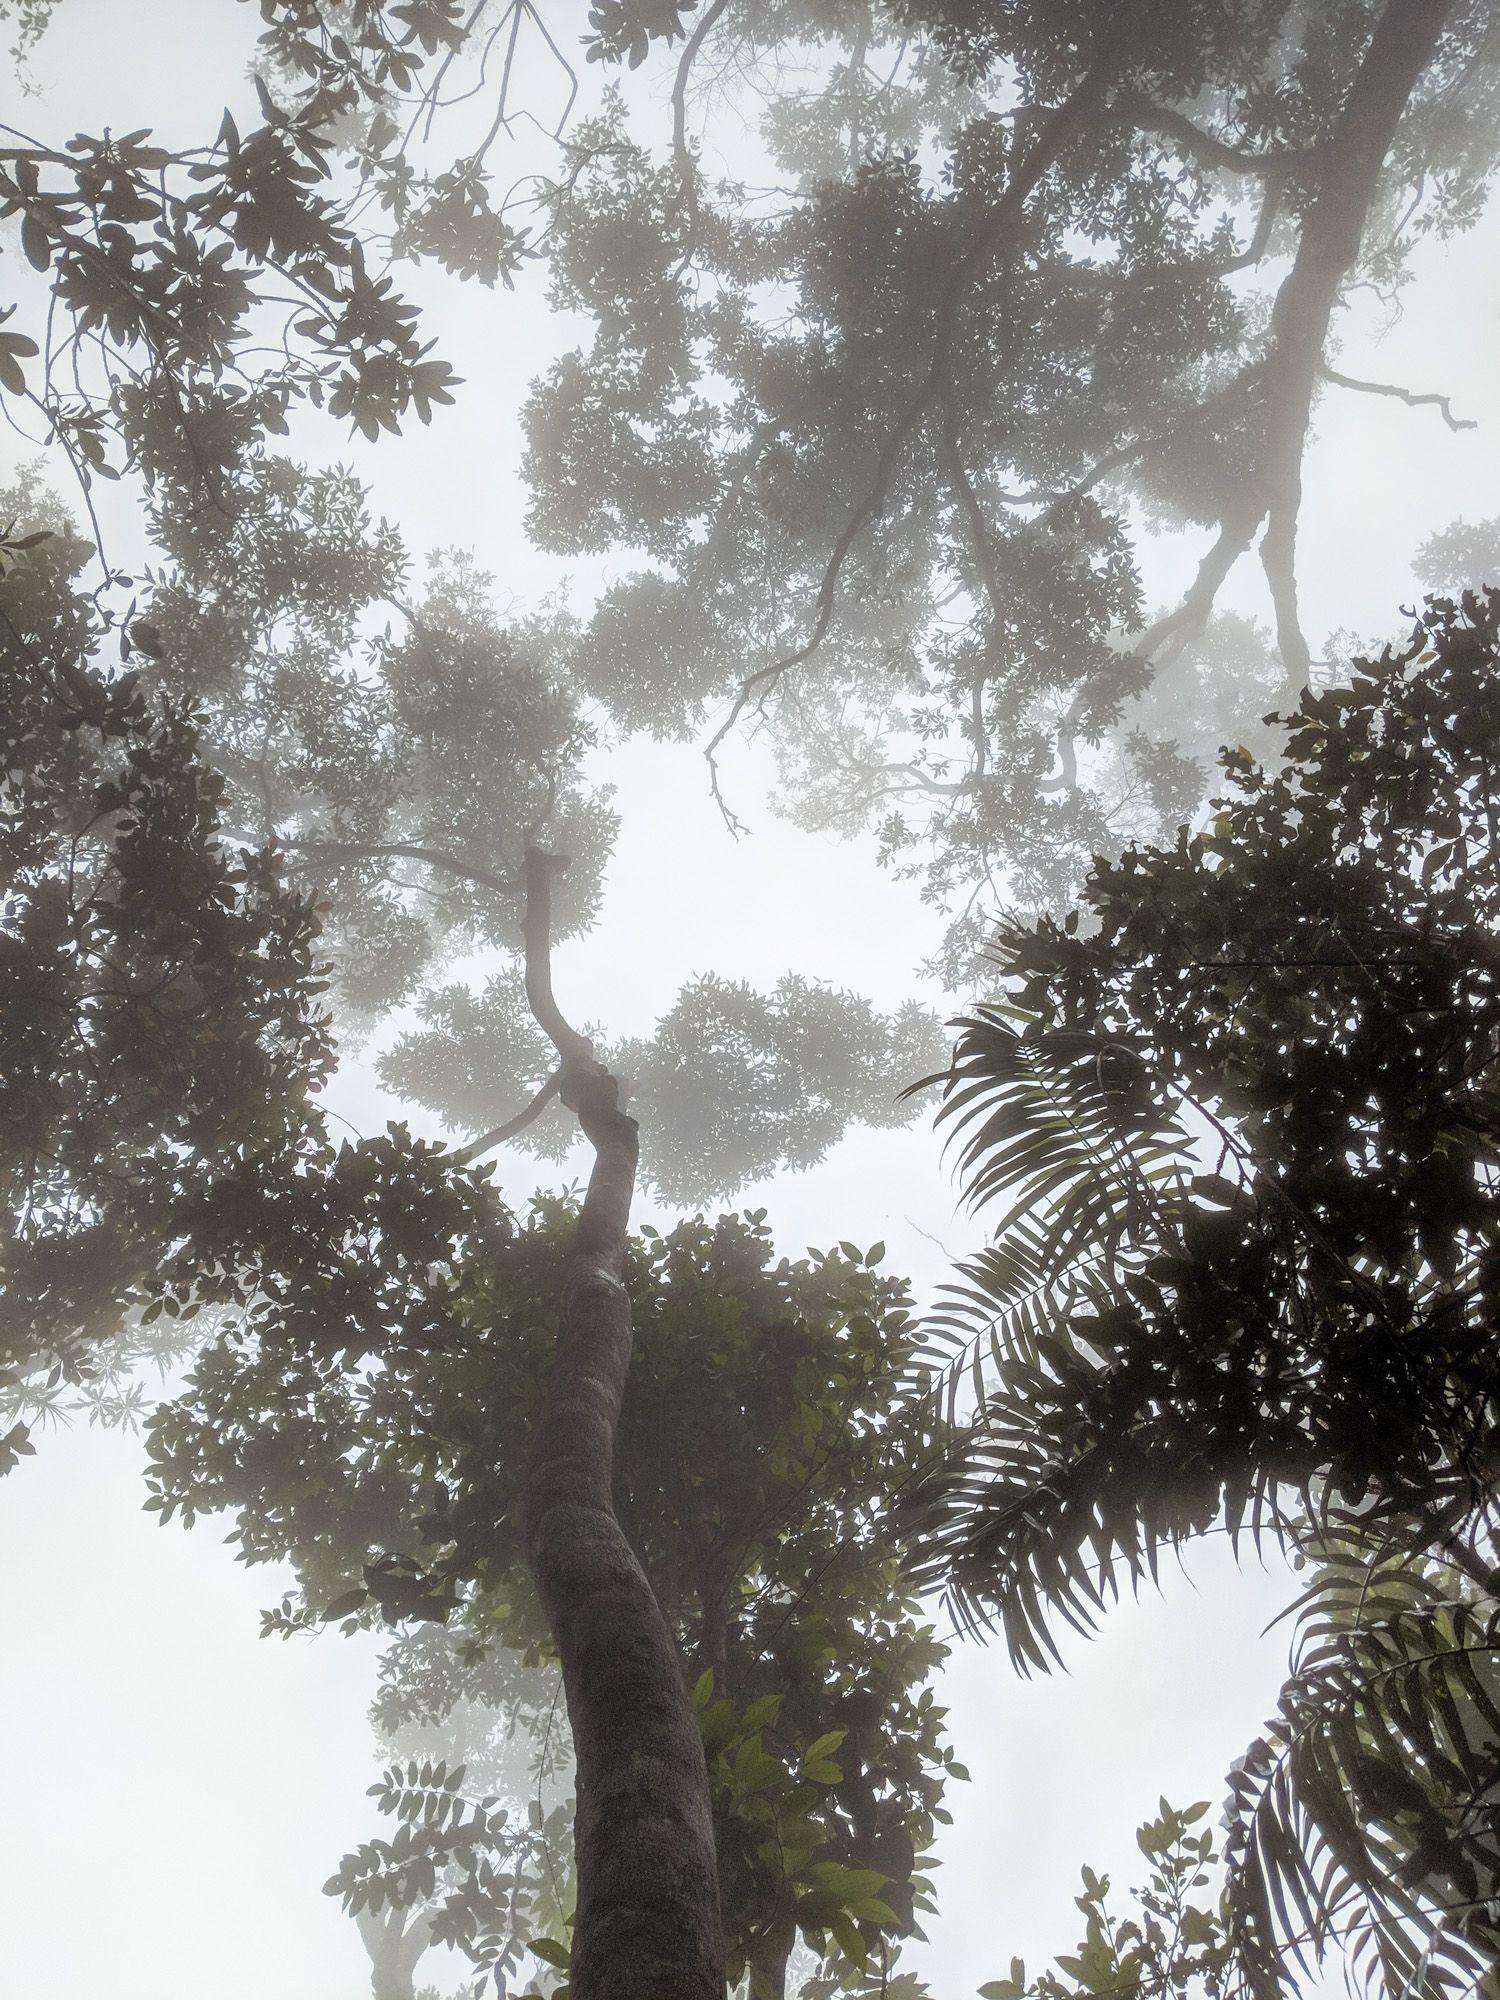 mt straloch mist canopy